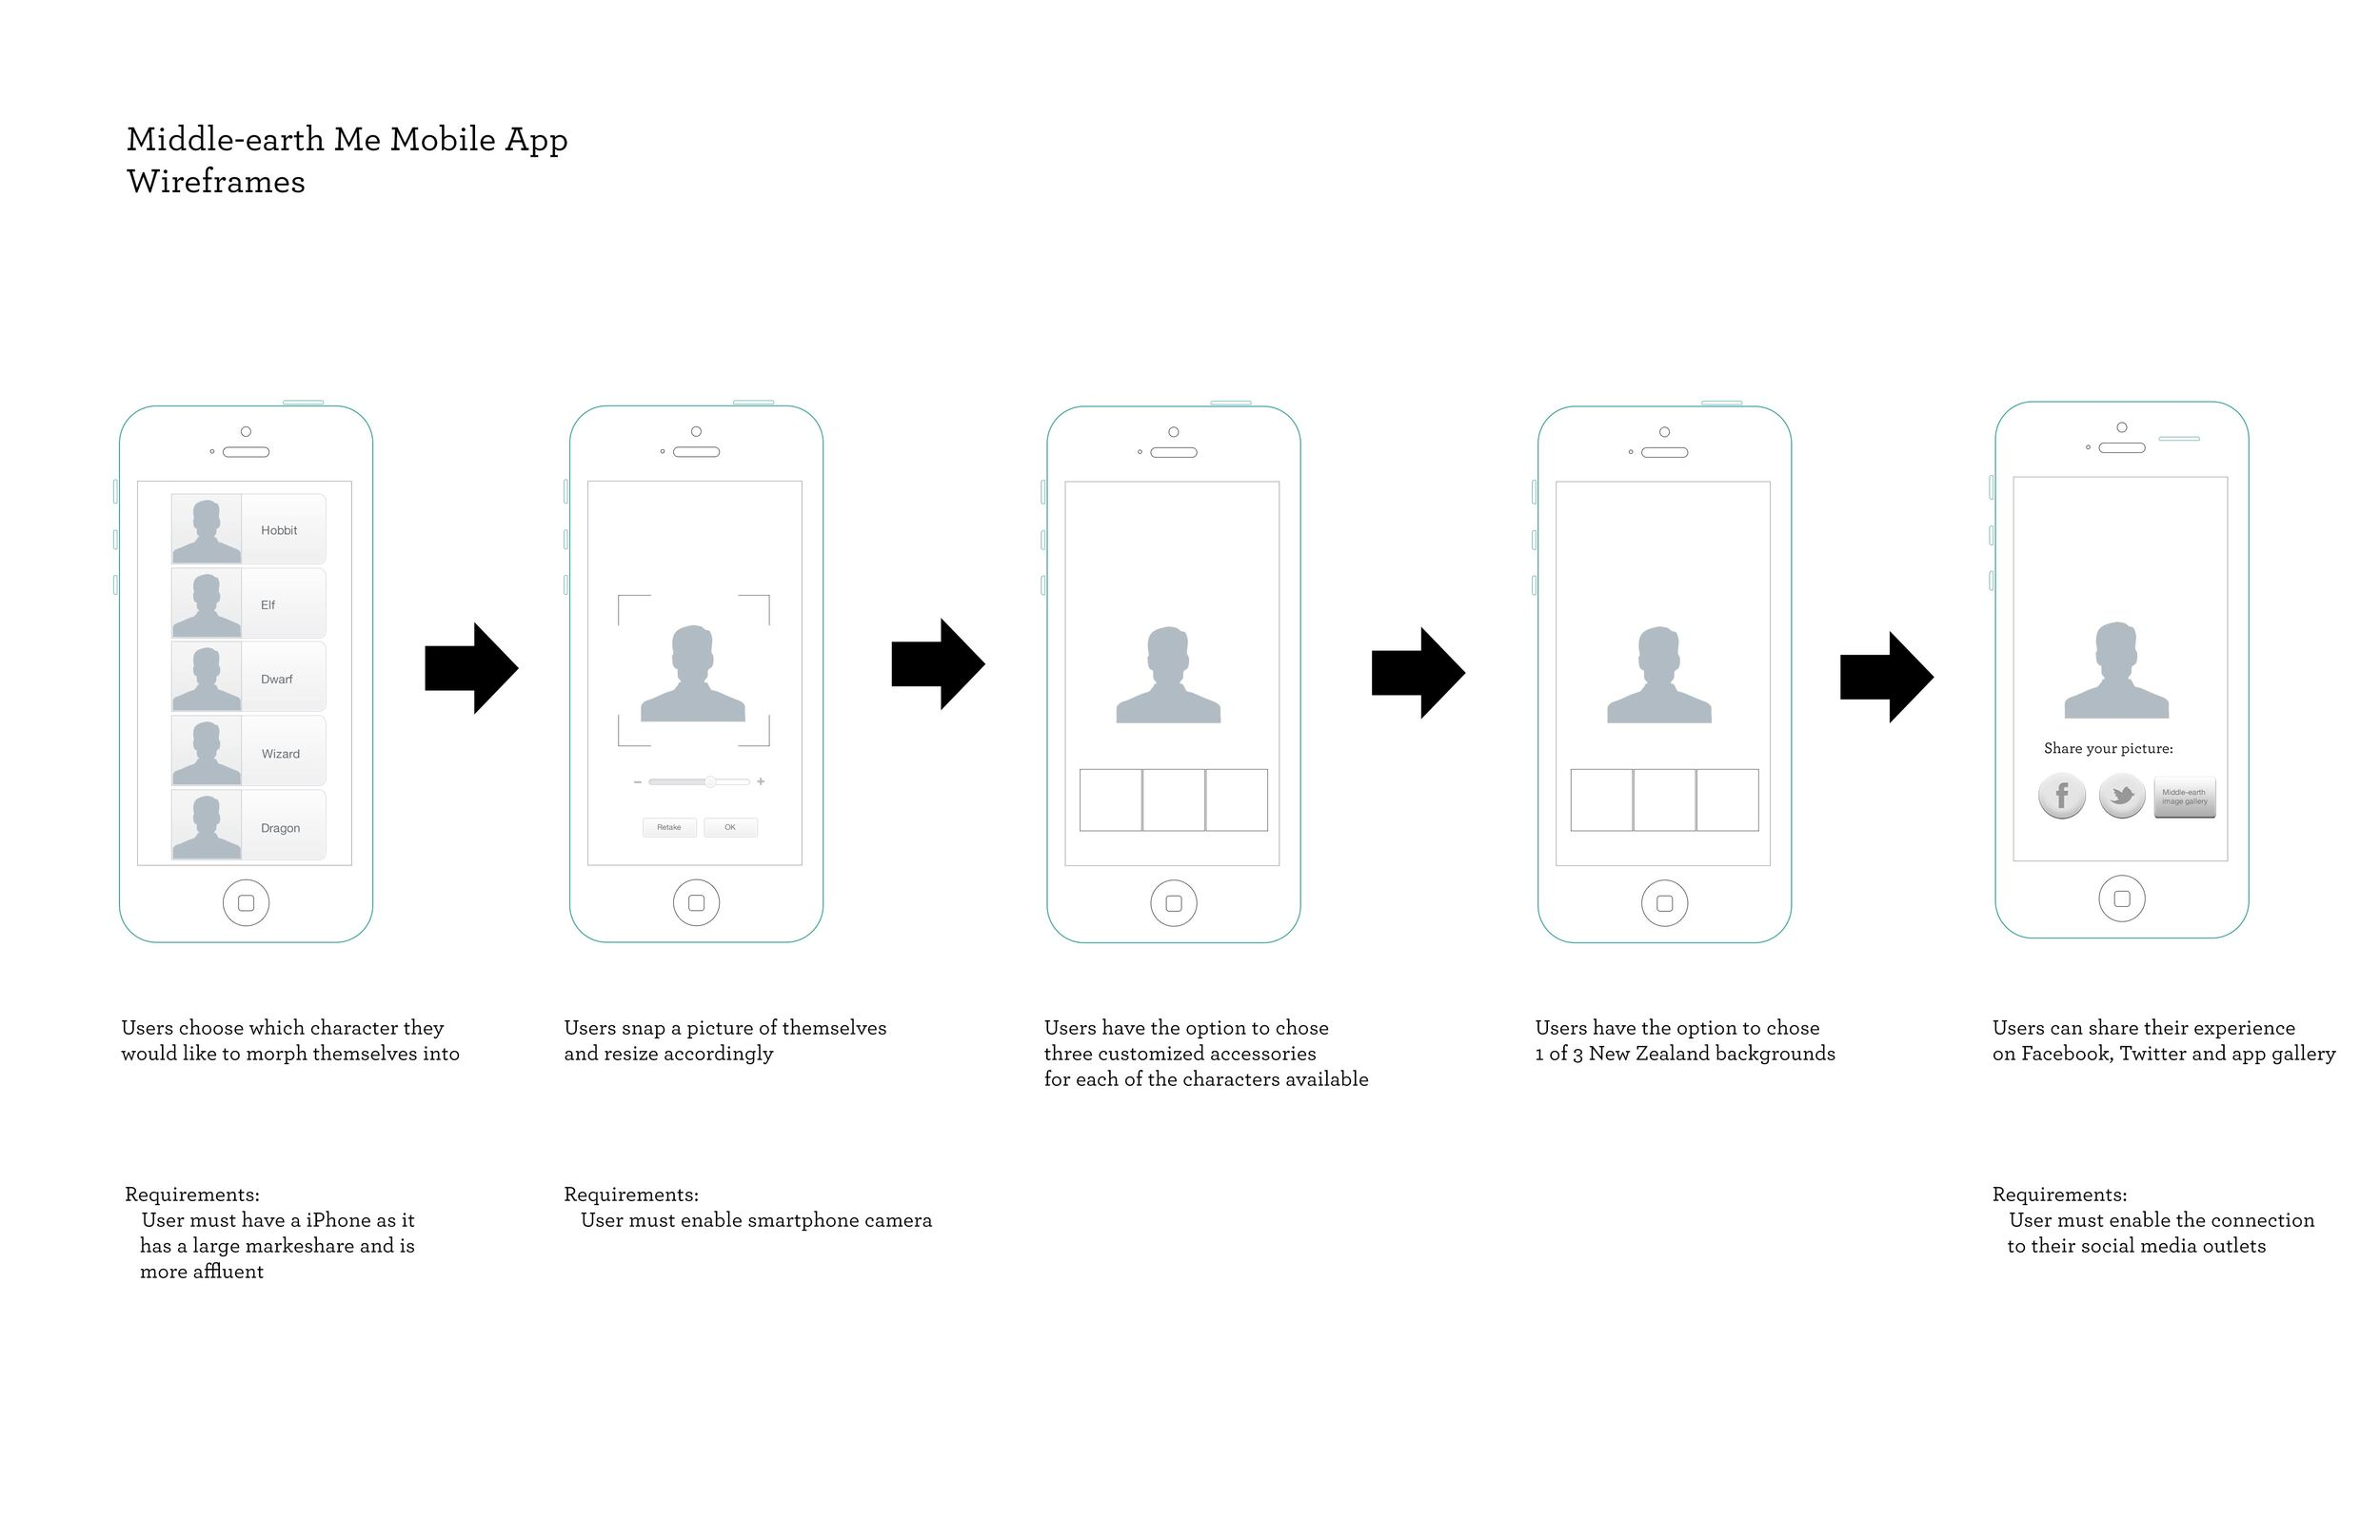 TNZ Mobile Me Mobile App Wireframes